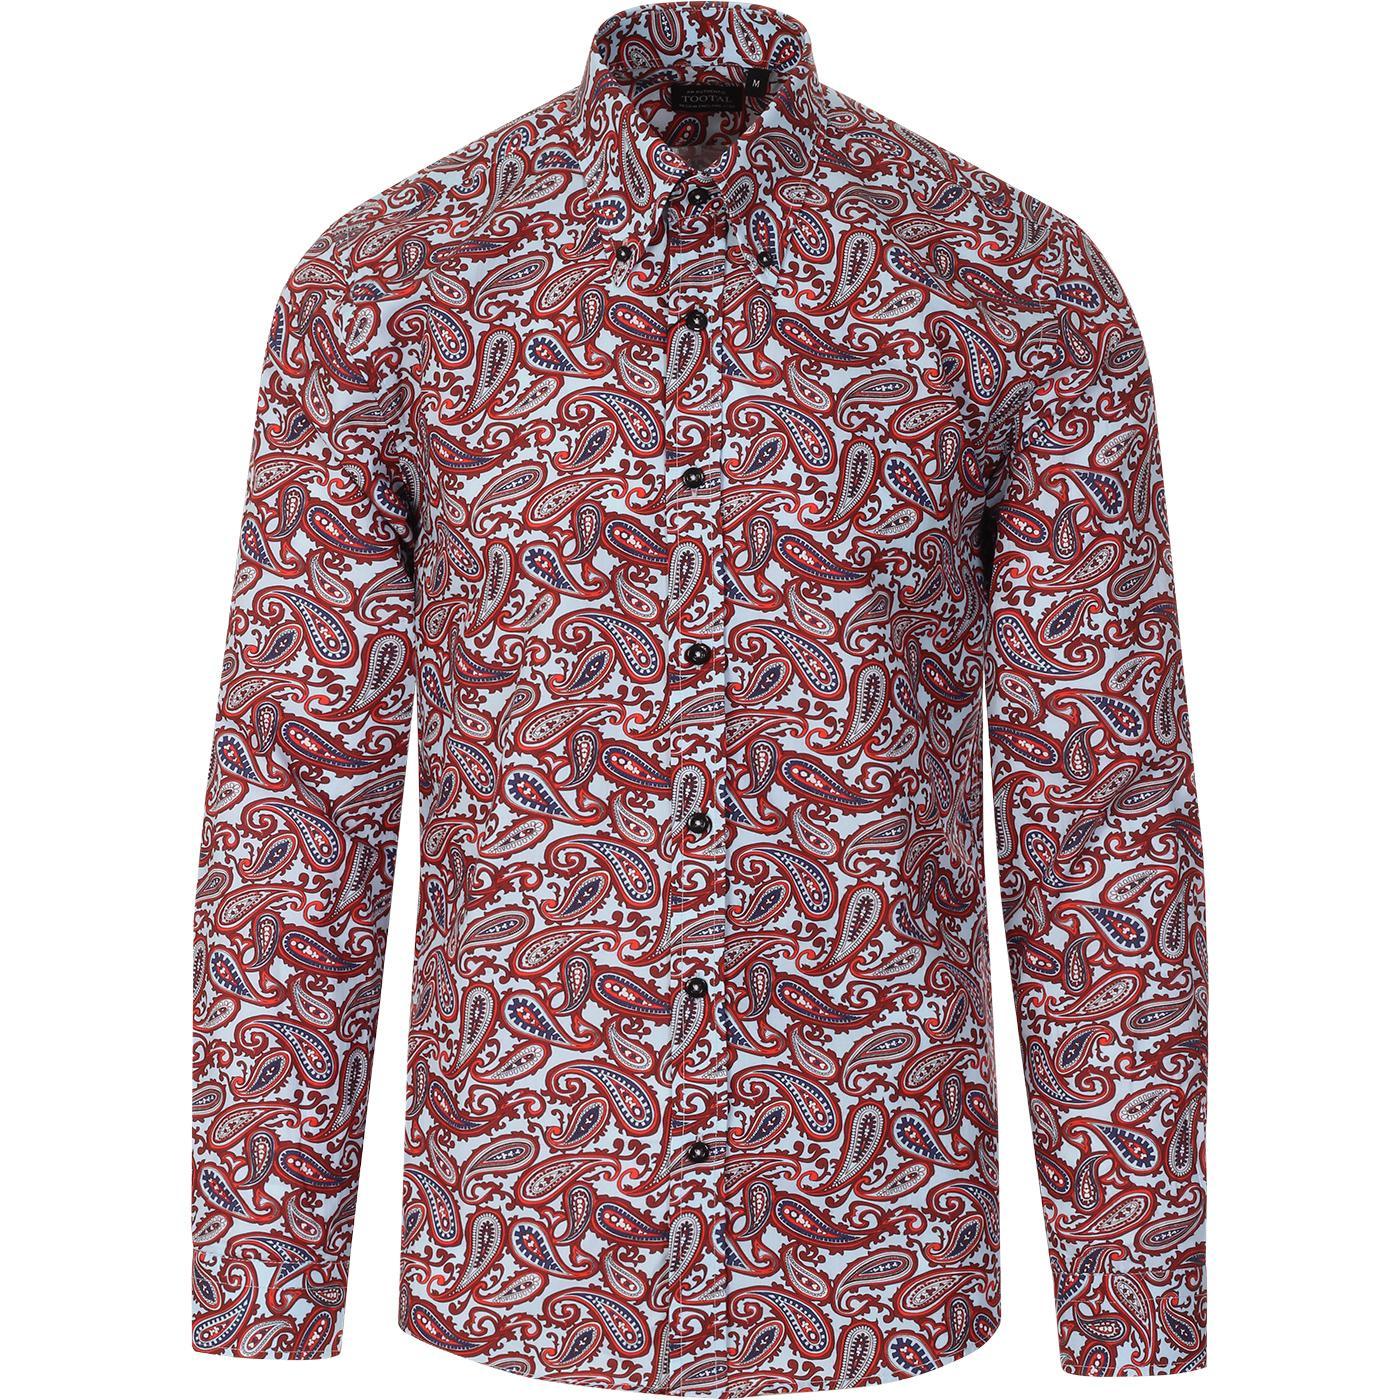 TOOTAL Mod Bold Paisley Button Down Shirt (B/R)